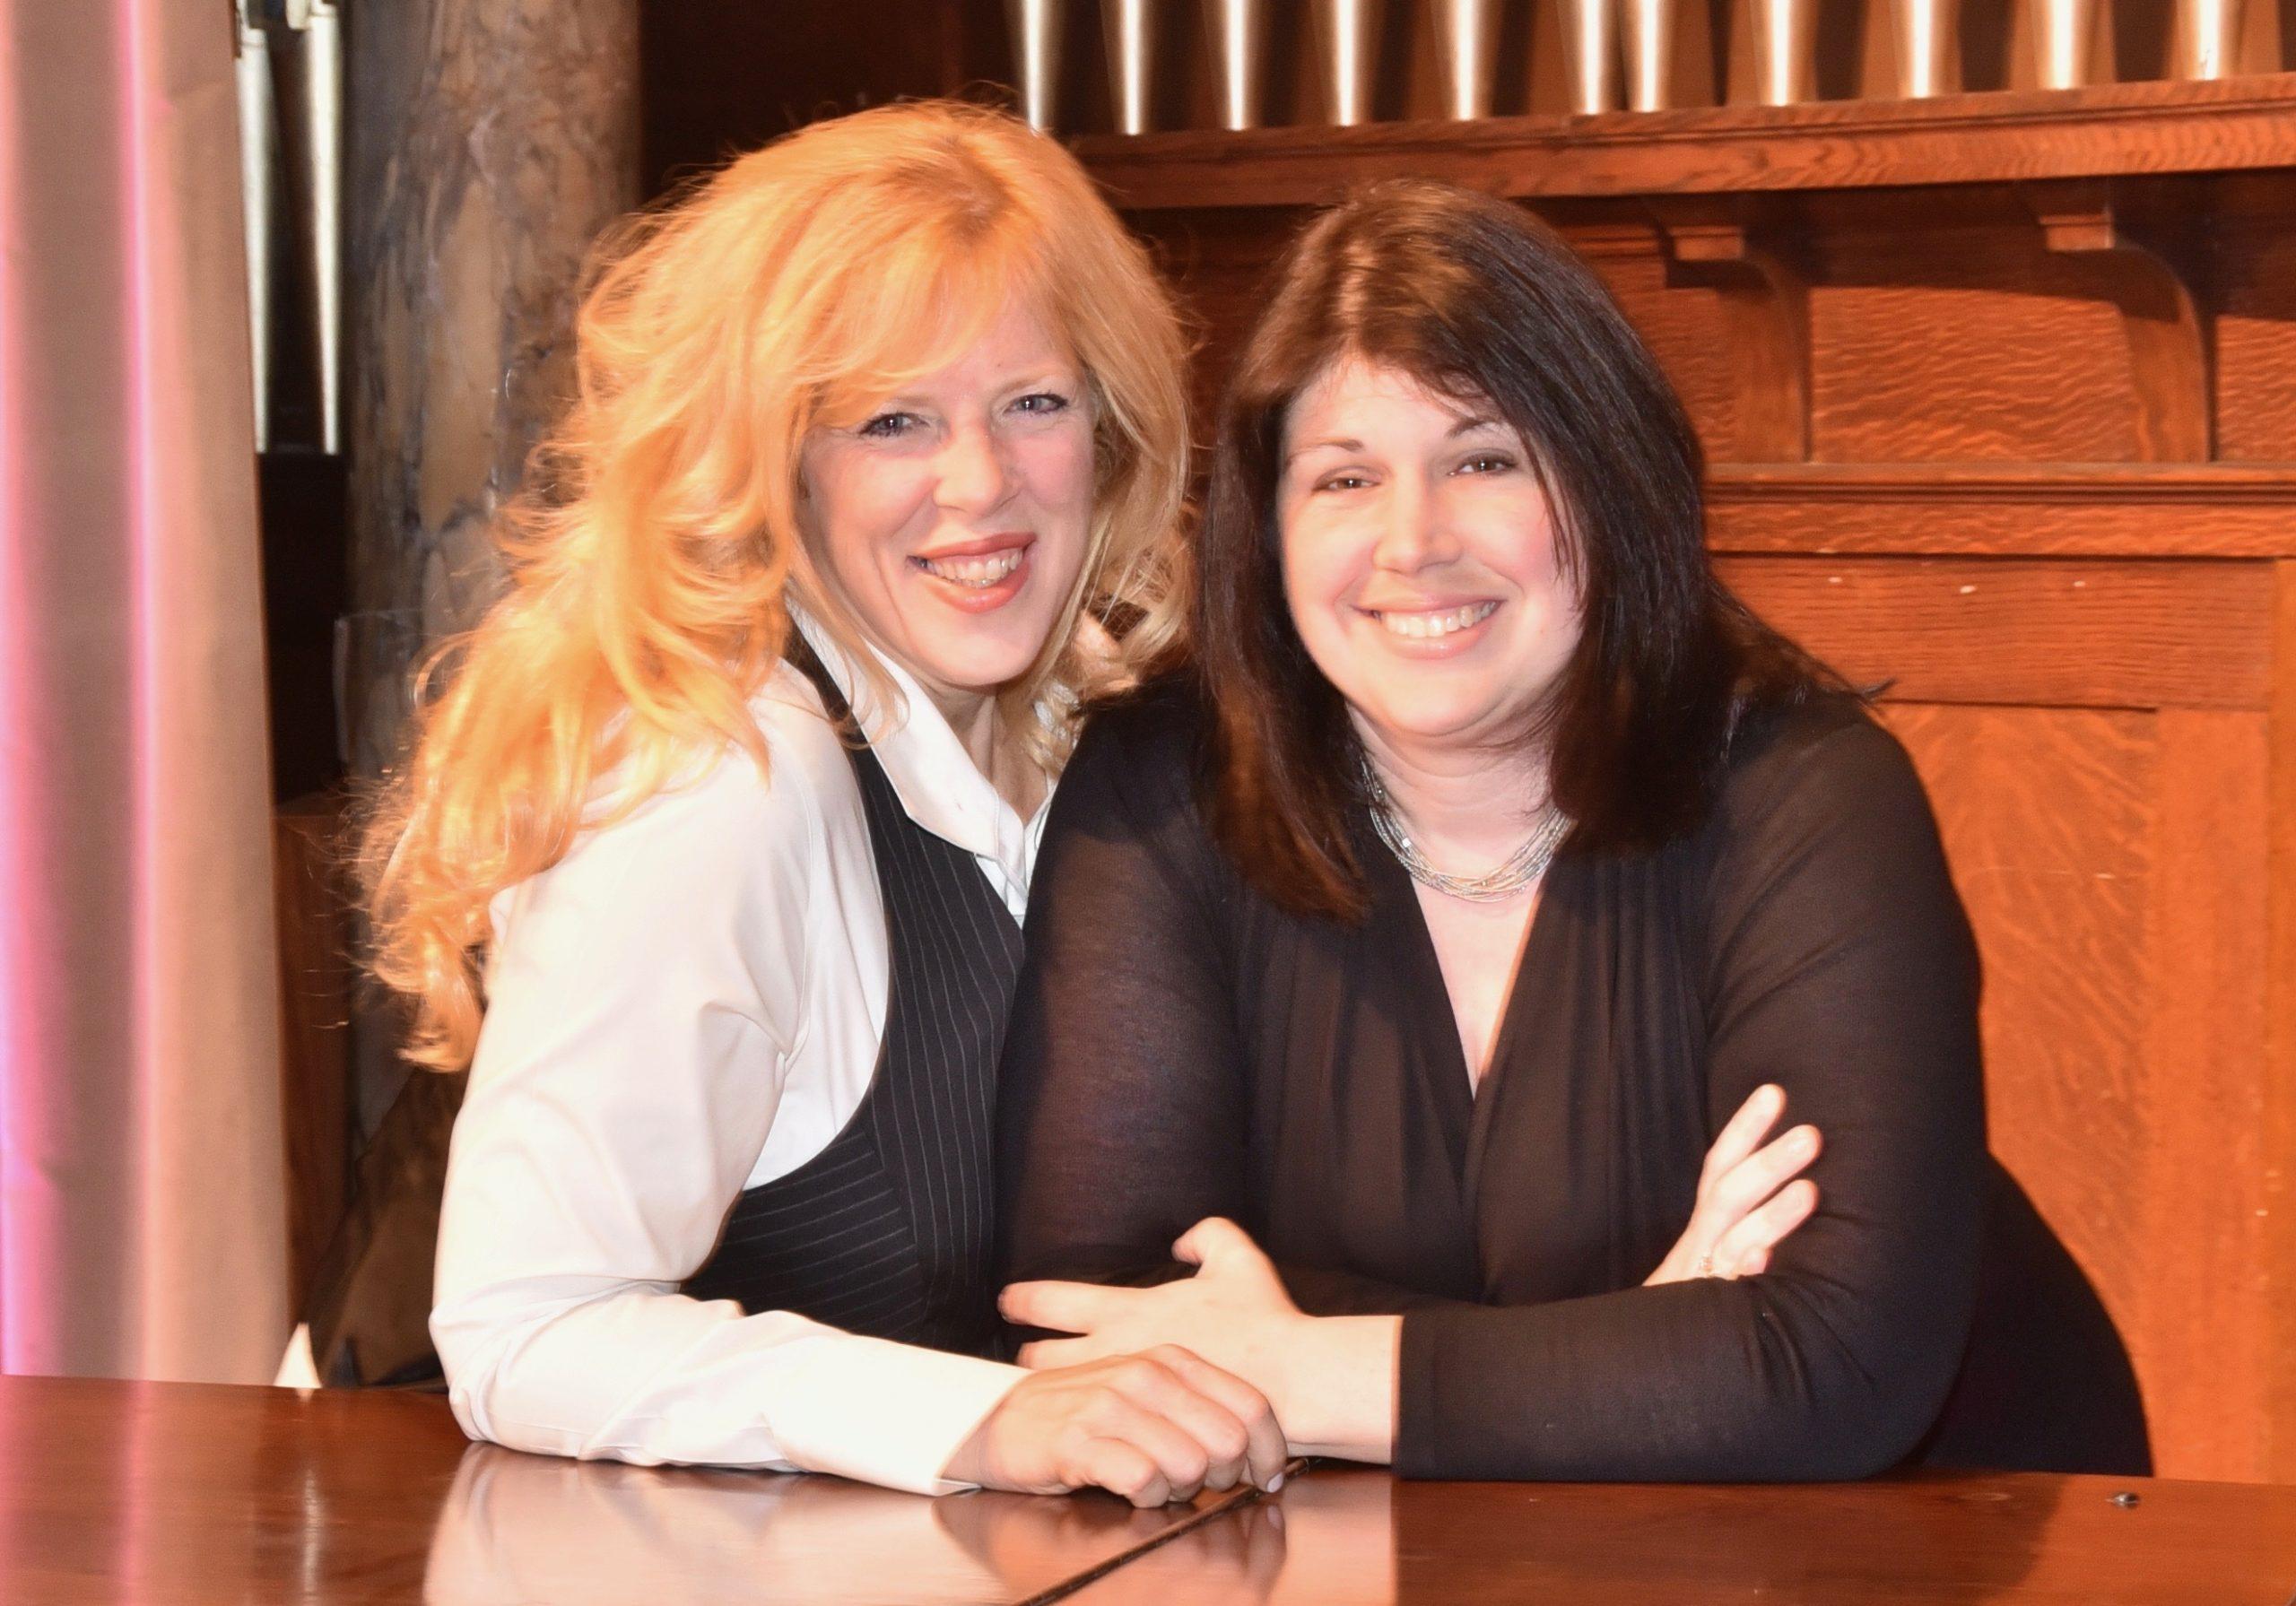 Valerie diLorenzo and Amanda Borsack Jones.